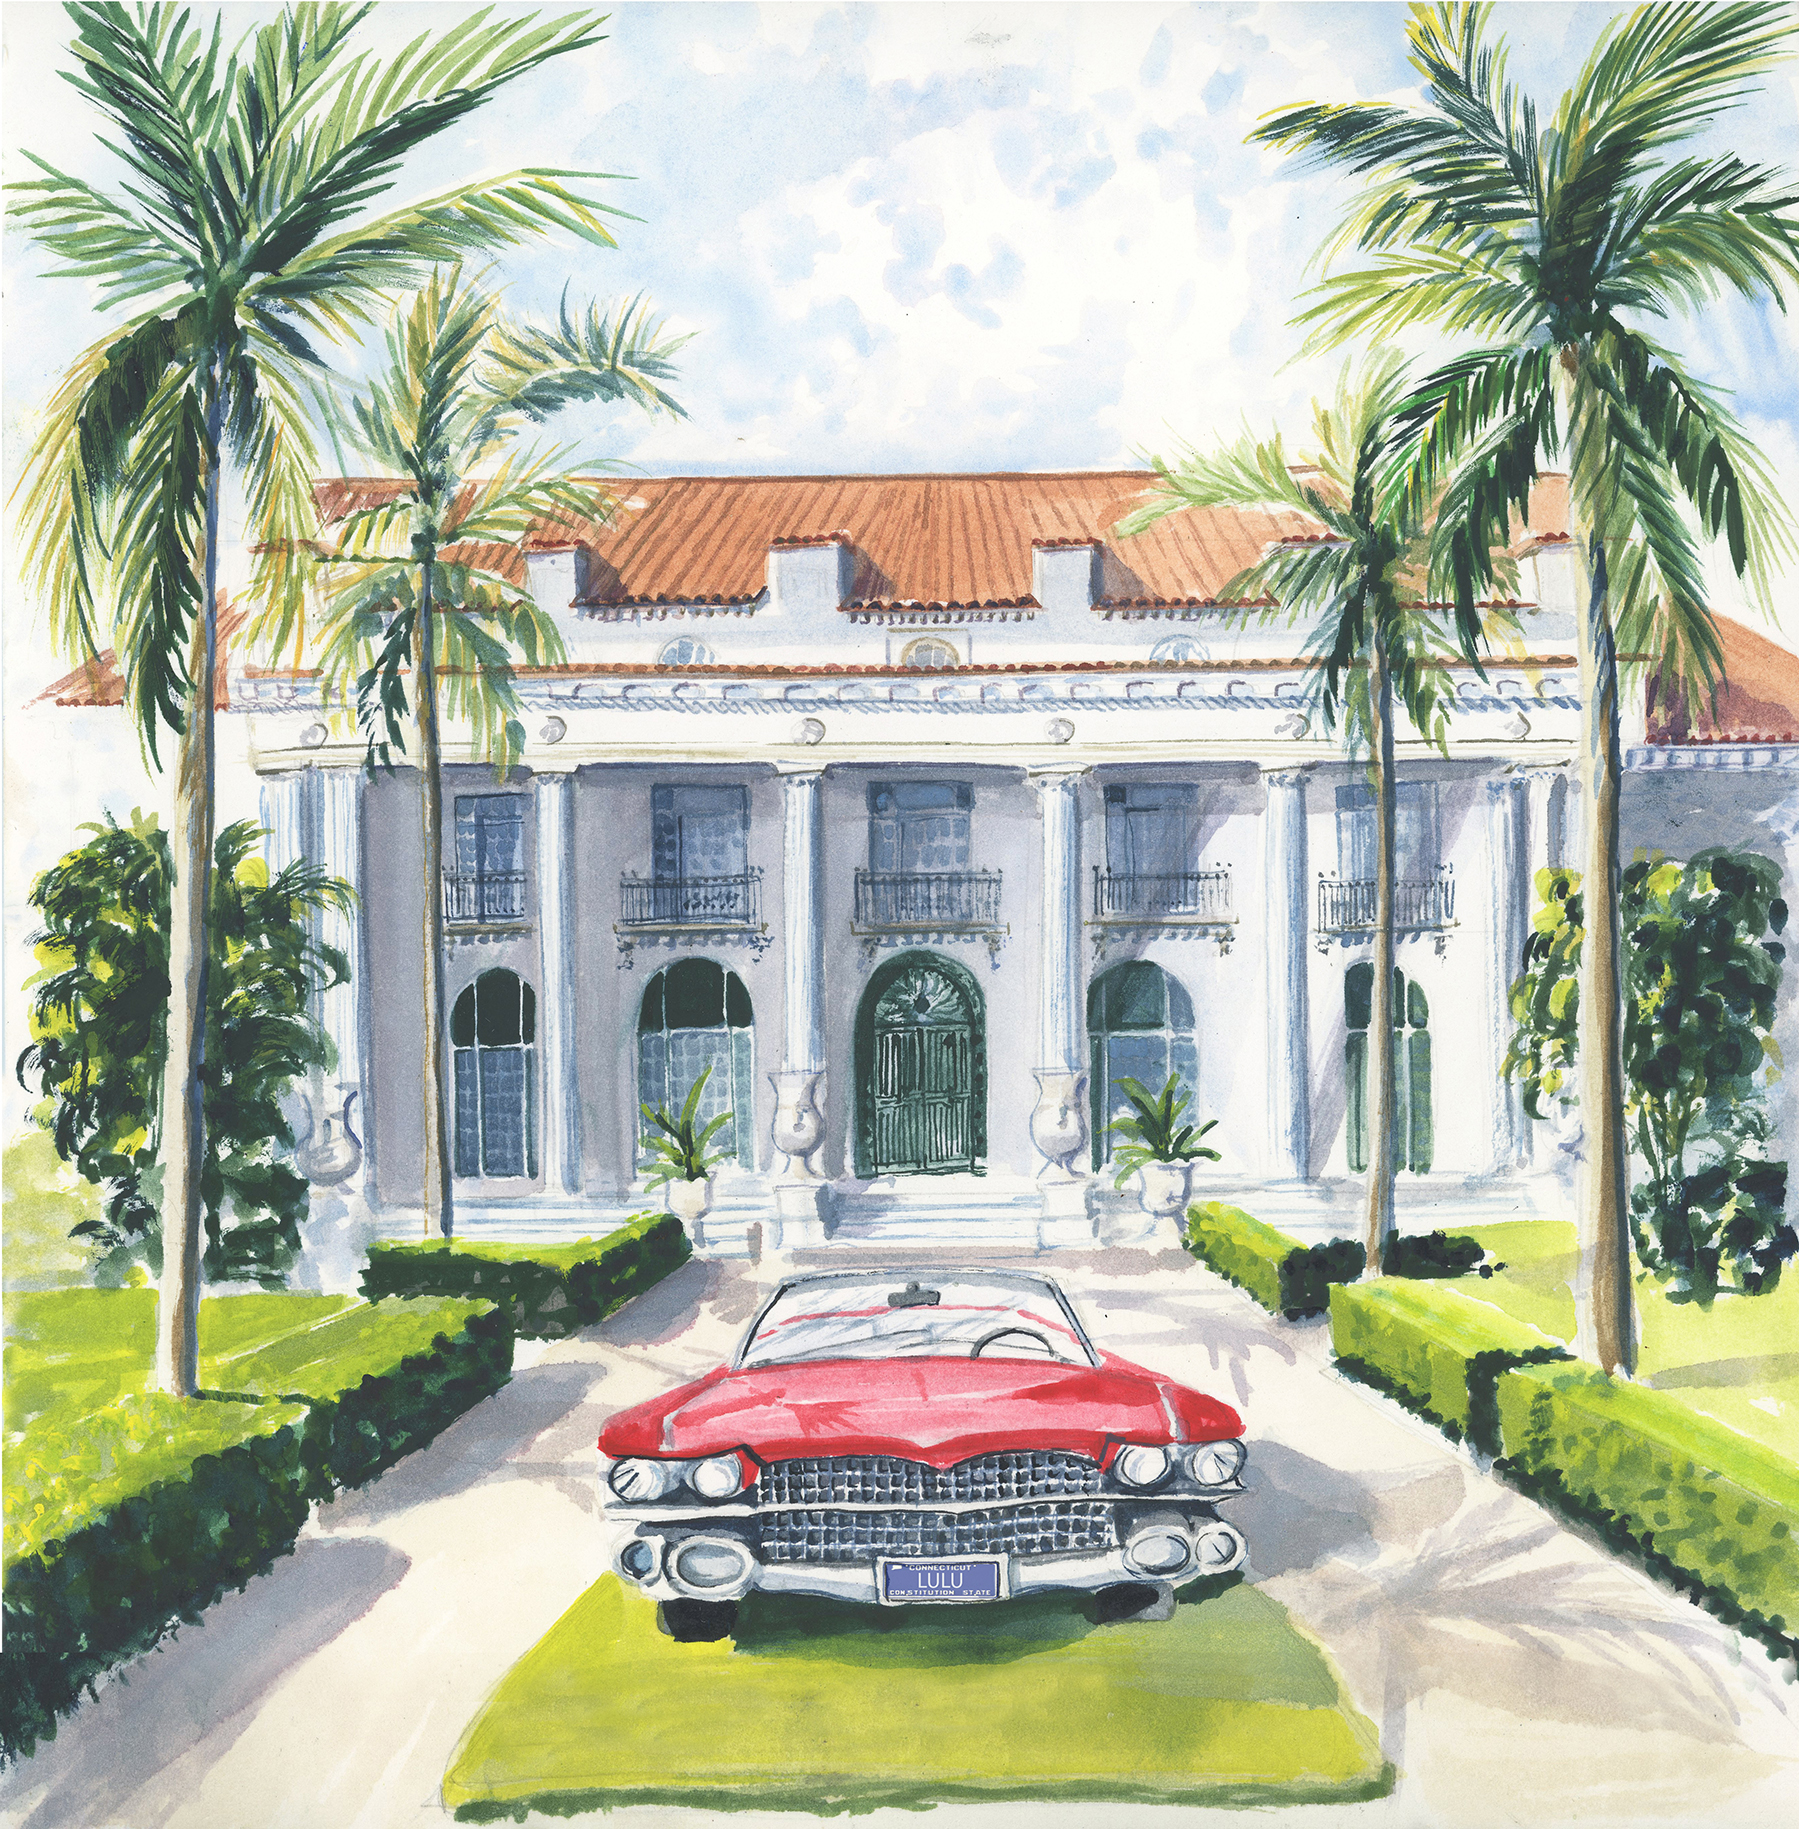 Lydia Marie Elizabeth watercolor of Flaggler Museum in Palm Beach inspired by Slim Aarons for the 2019 American Road Trip desk calendar.jpg